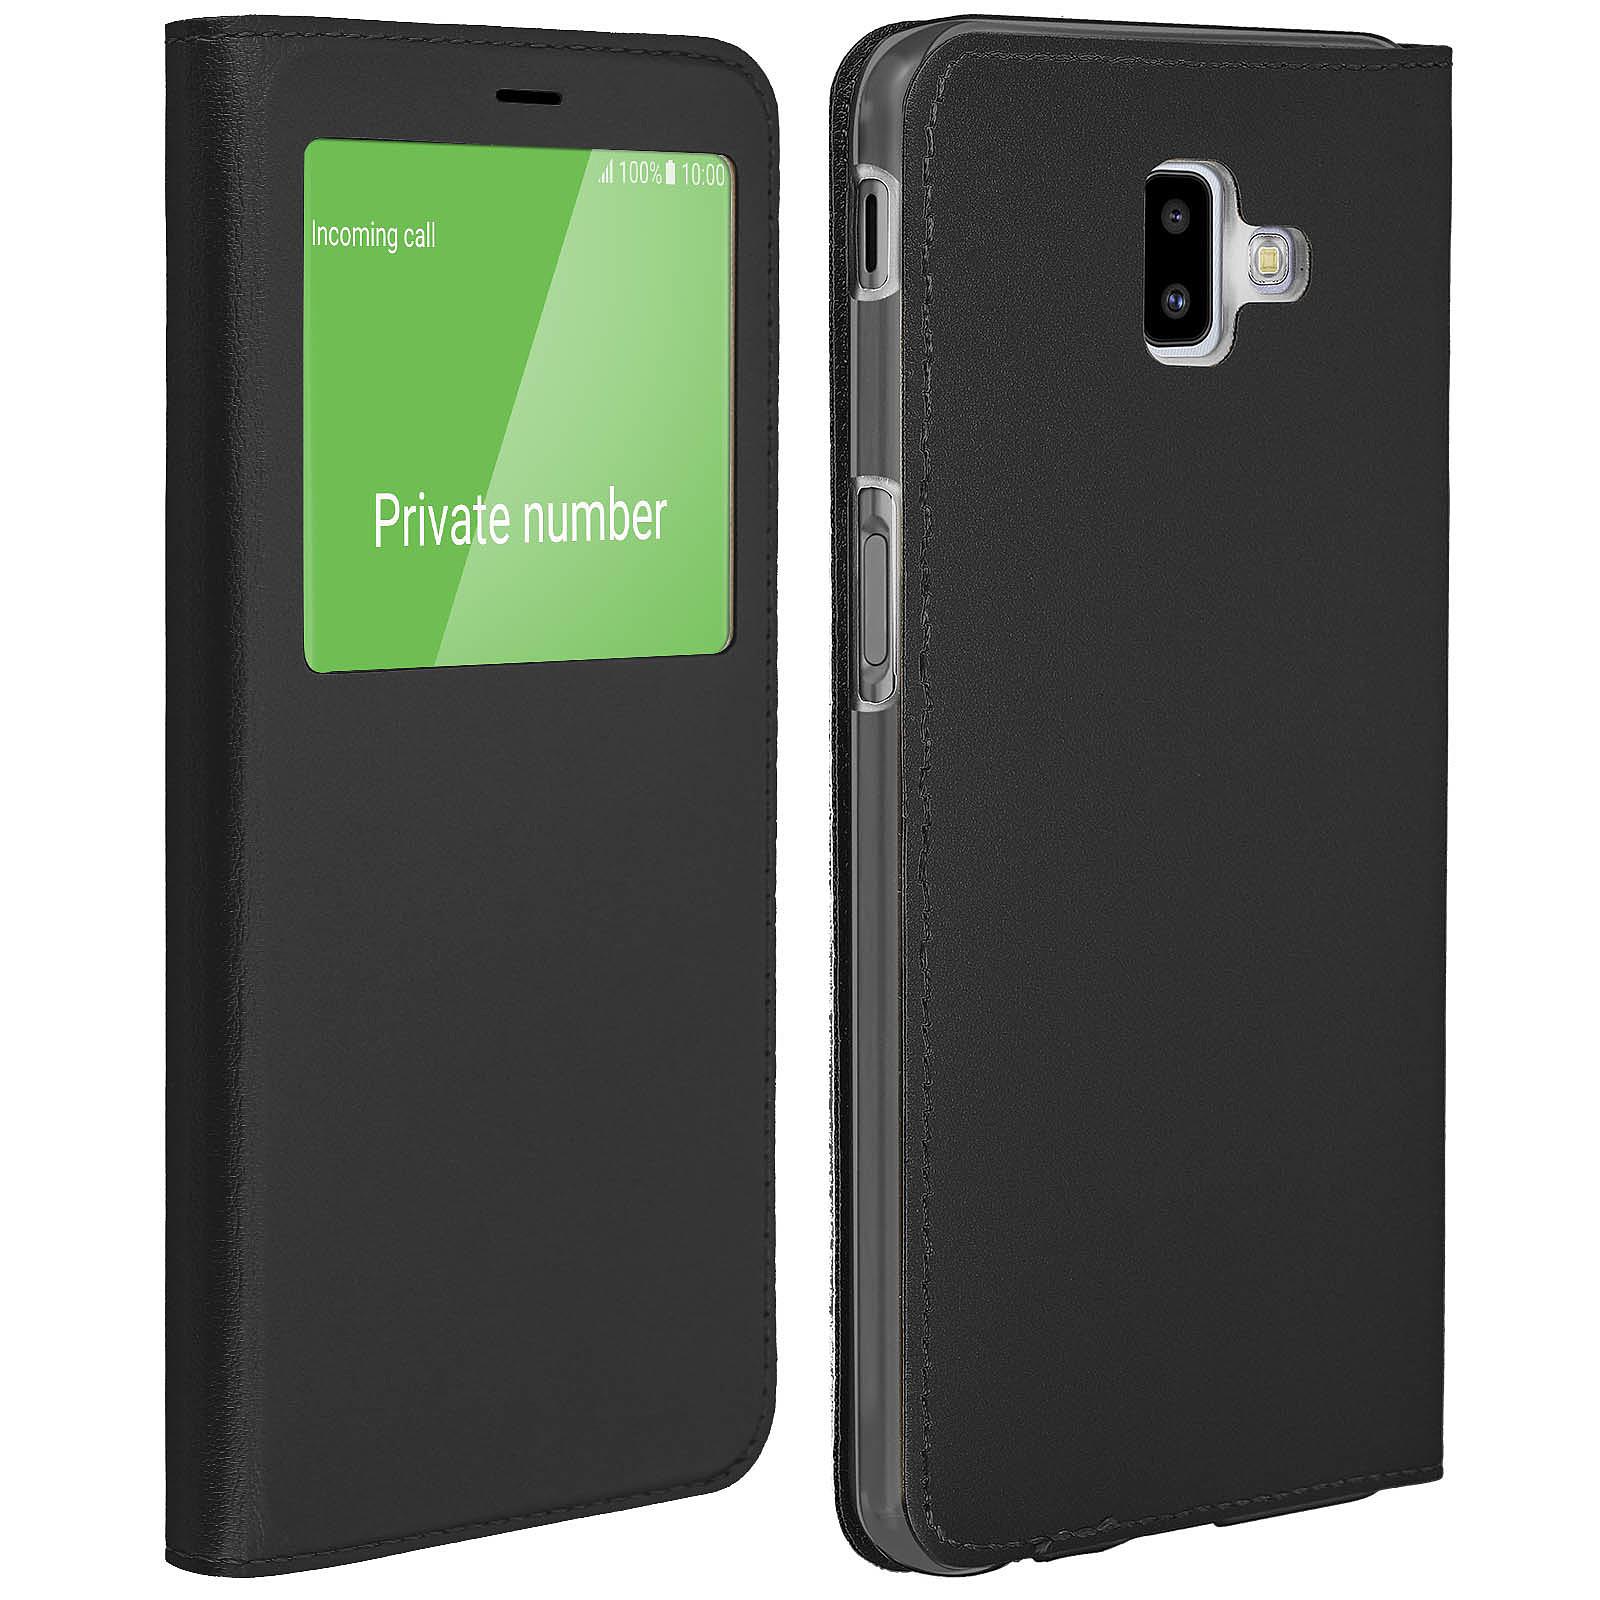 Avizar Etui folio Noir pour Samsung Galaxy J6 Plus